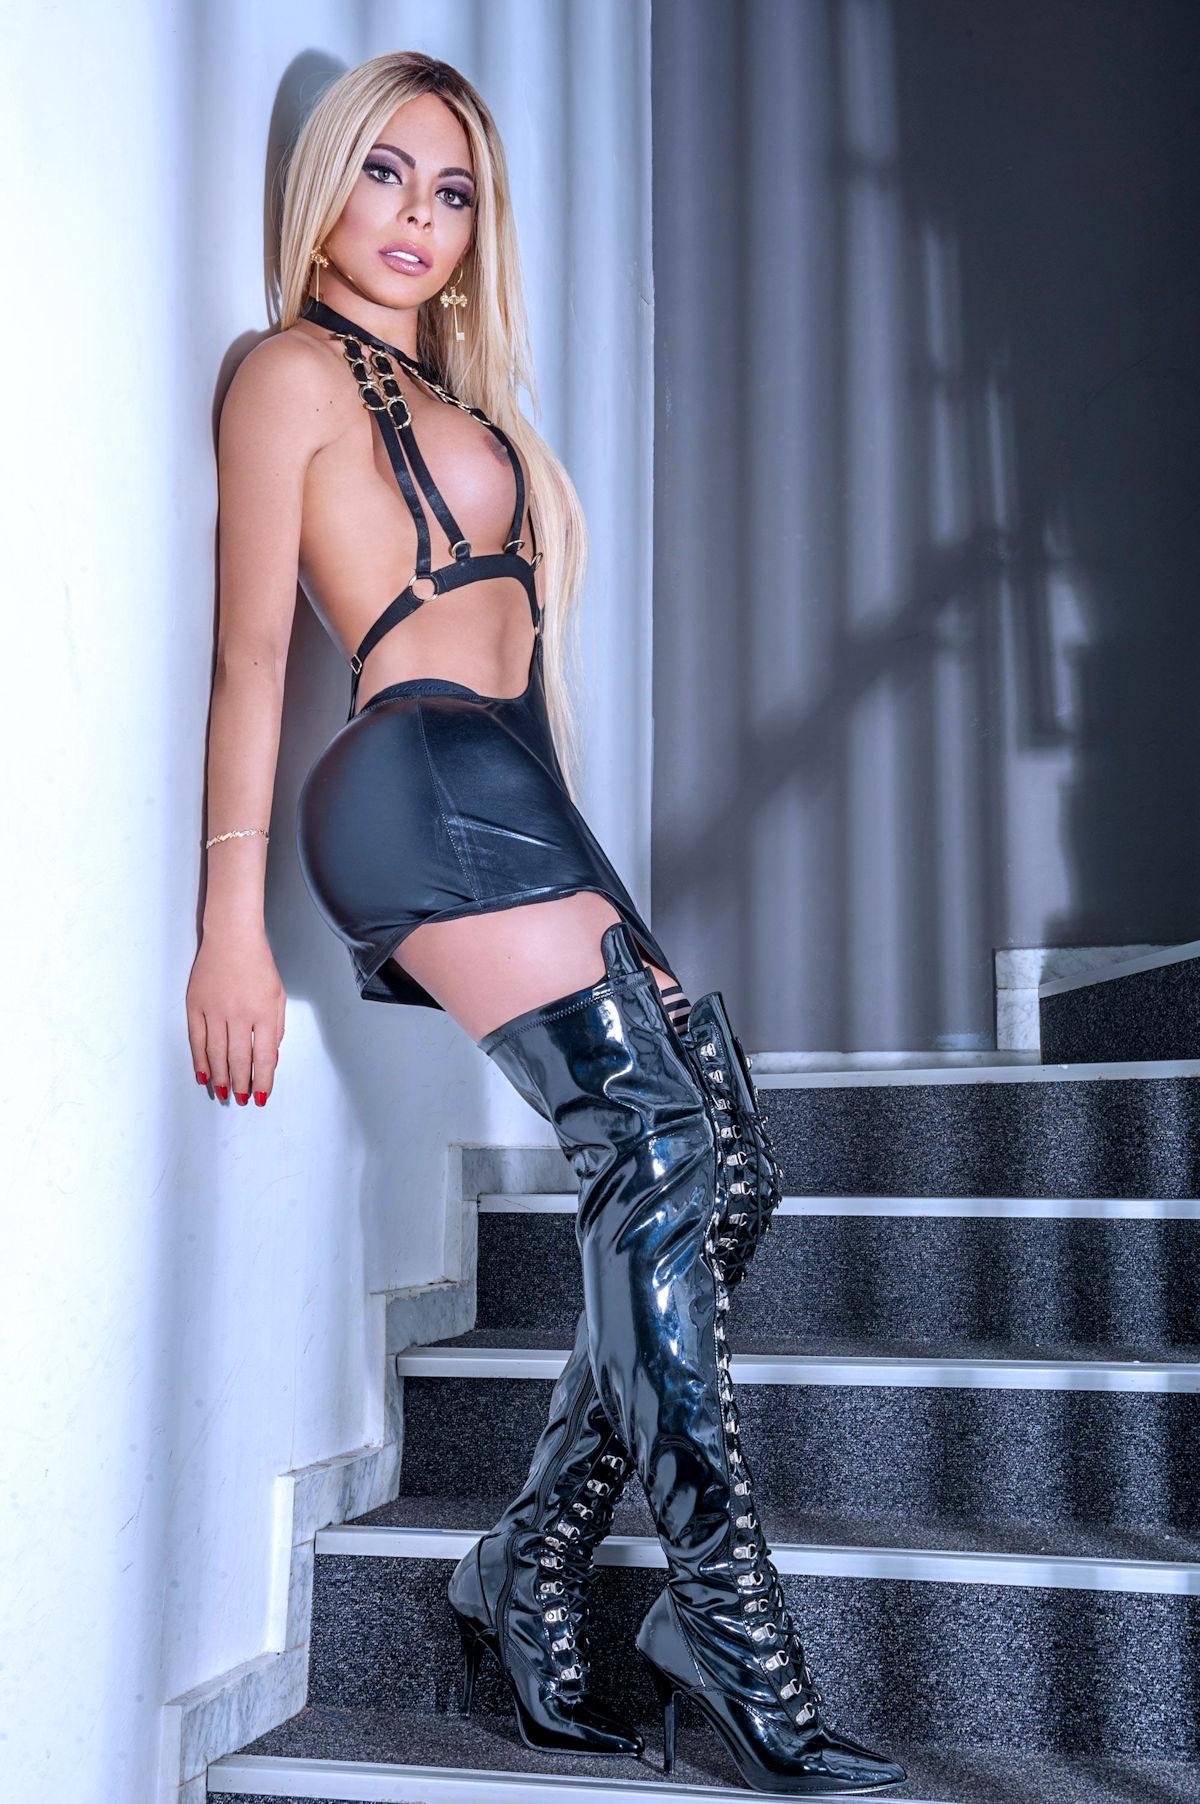 Beautiful Blonde TS Escort Khloe XXL